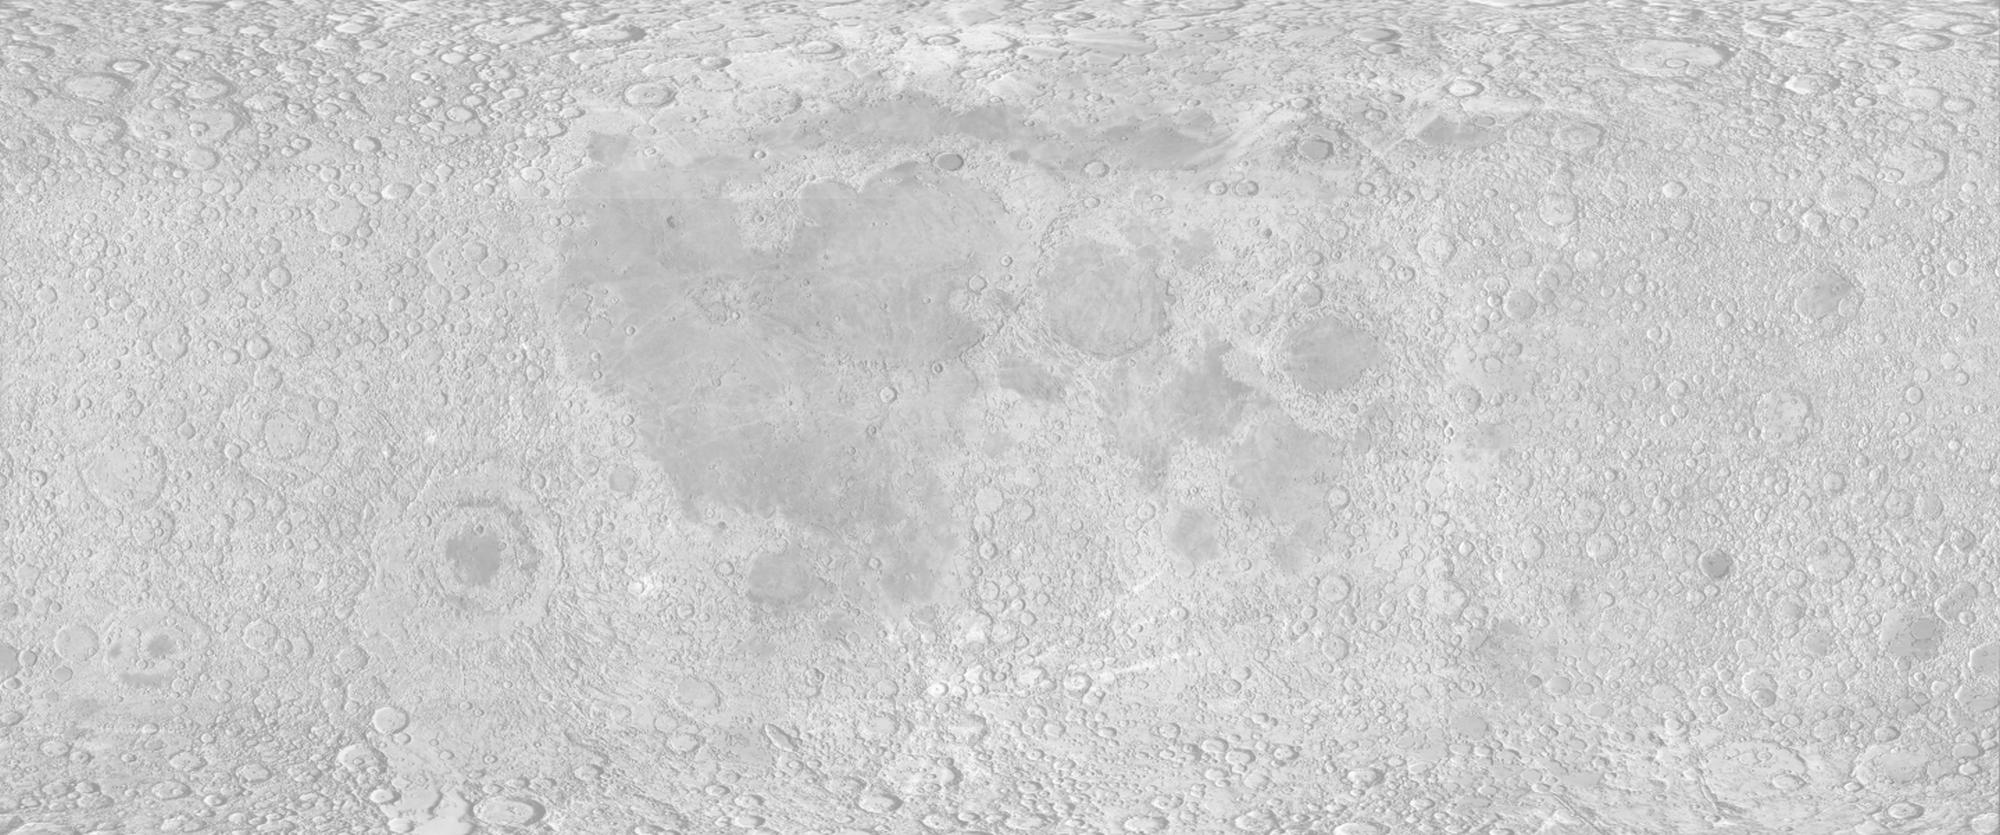 Lunar Real Estate Map